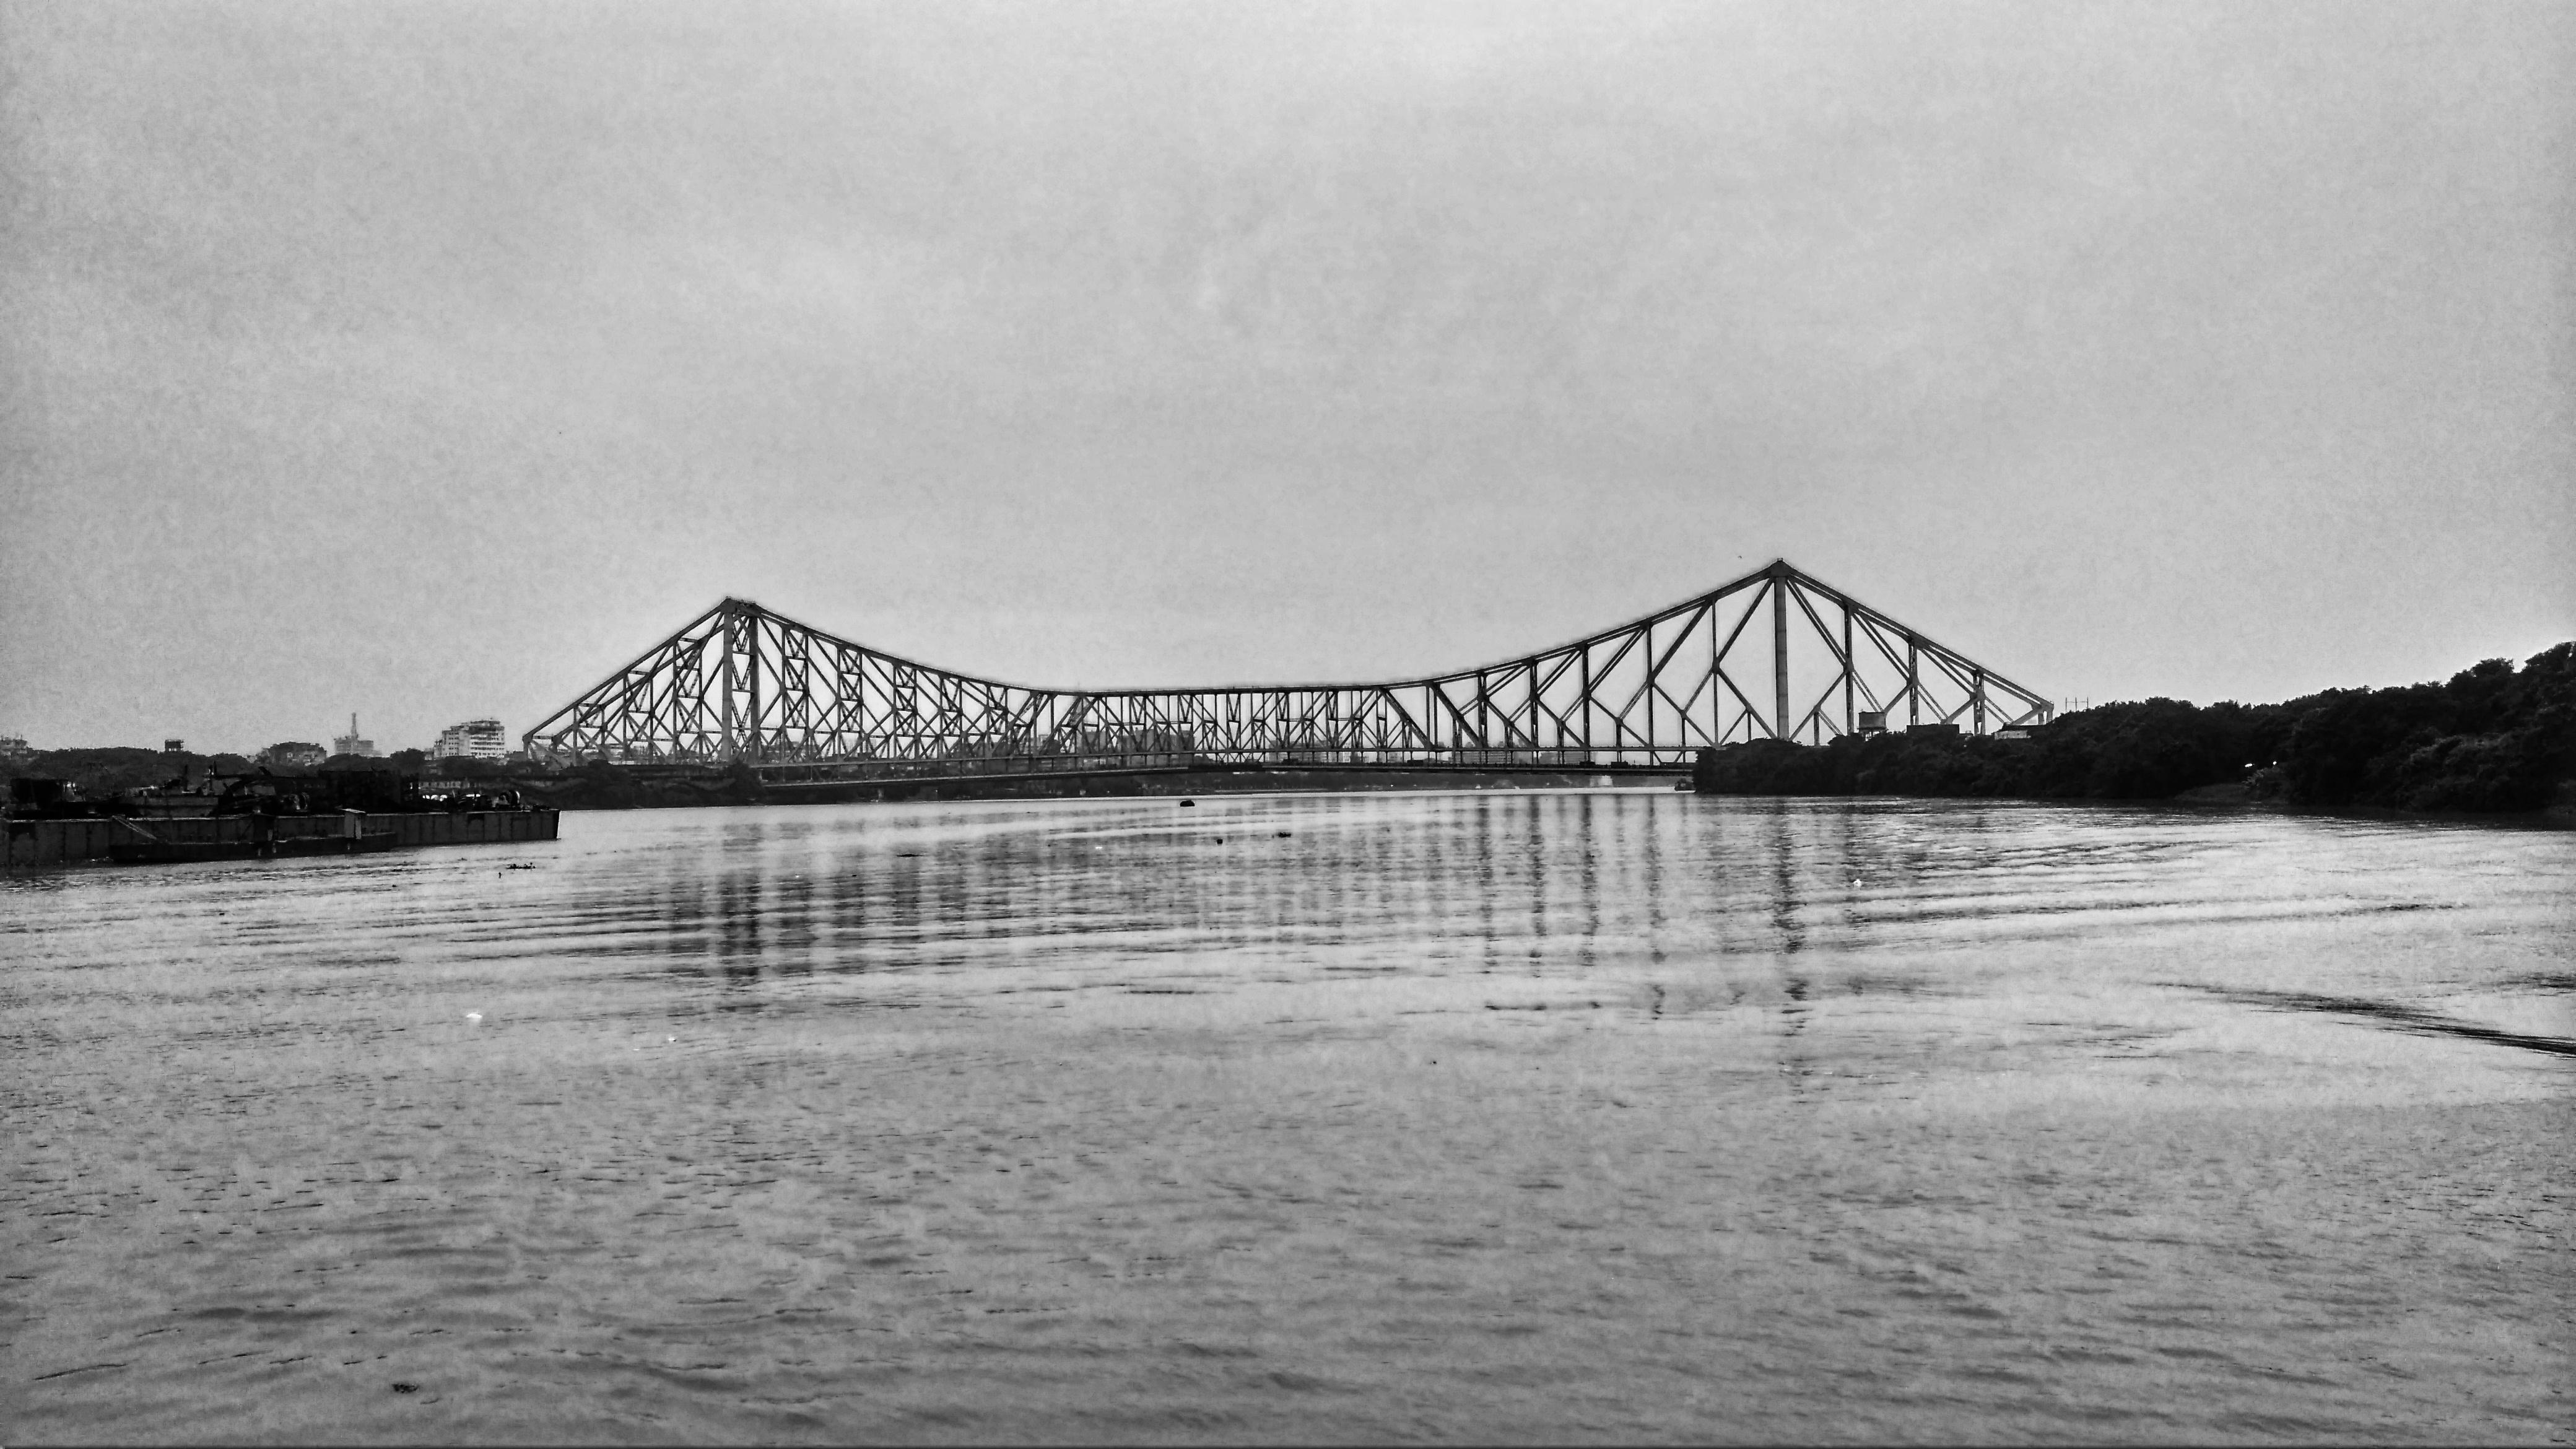 Howrah Bridge 4k Ultra Papel De Parede Hd Plano De Fundo